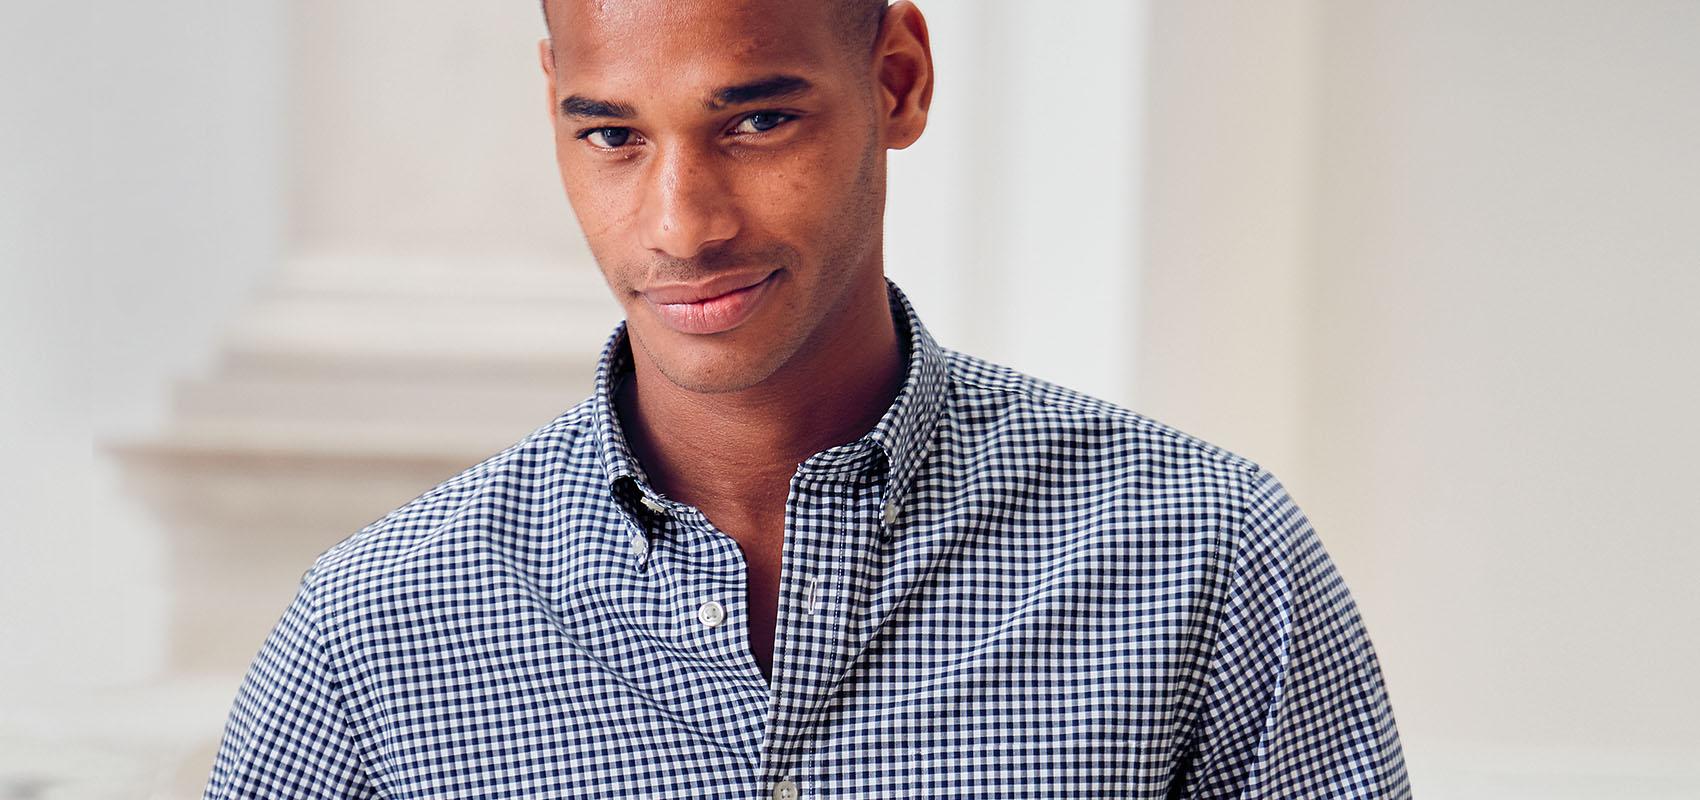 Charles Tyrwhitt Check Shirts